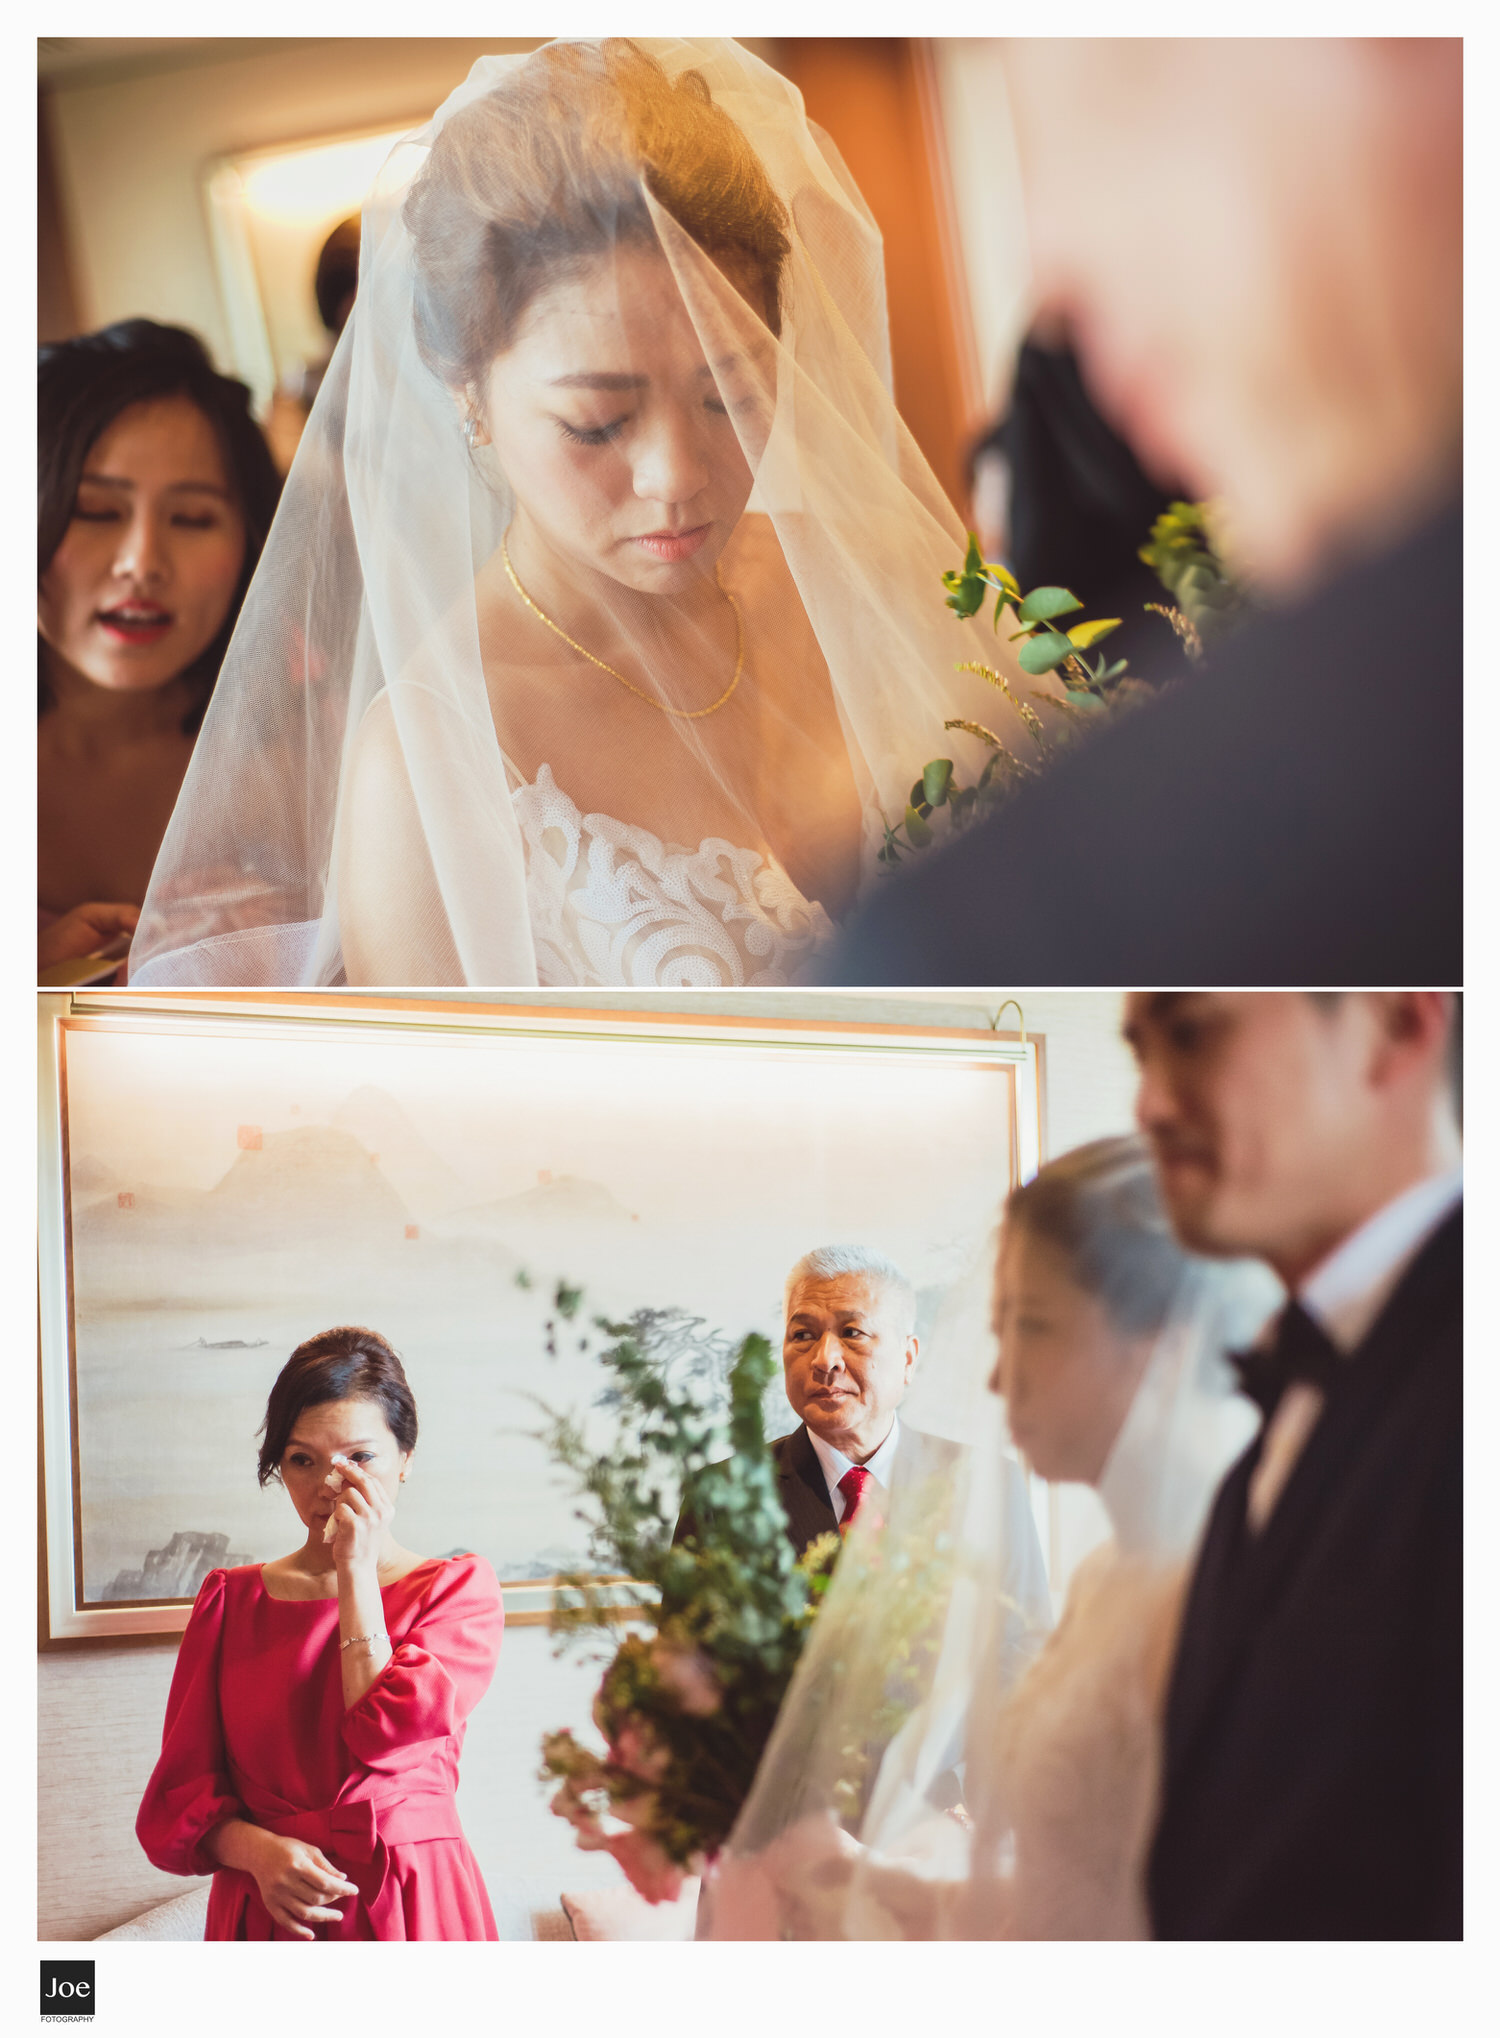 wedding-photography-shangri-la-far-eastern-plaza-hotel-ariel-sam-joe-fotography-076.jpg